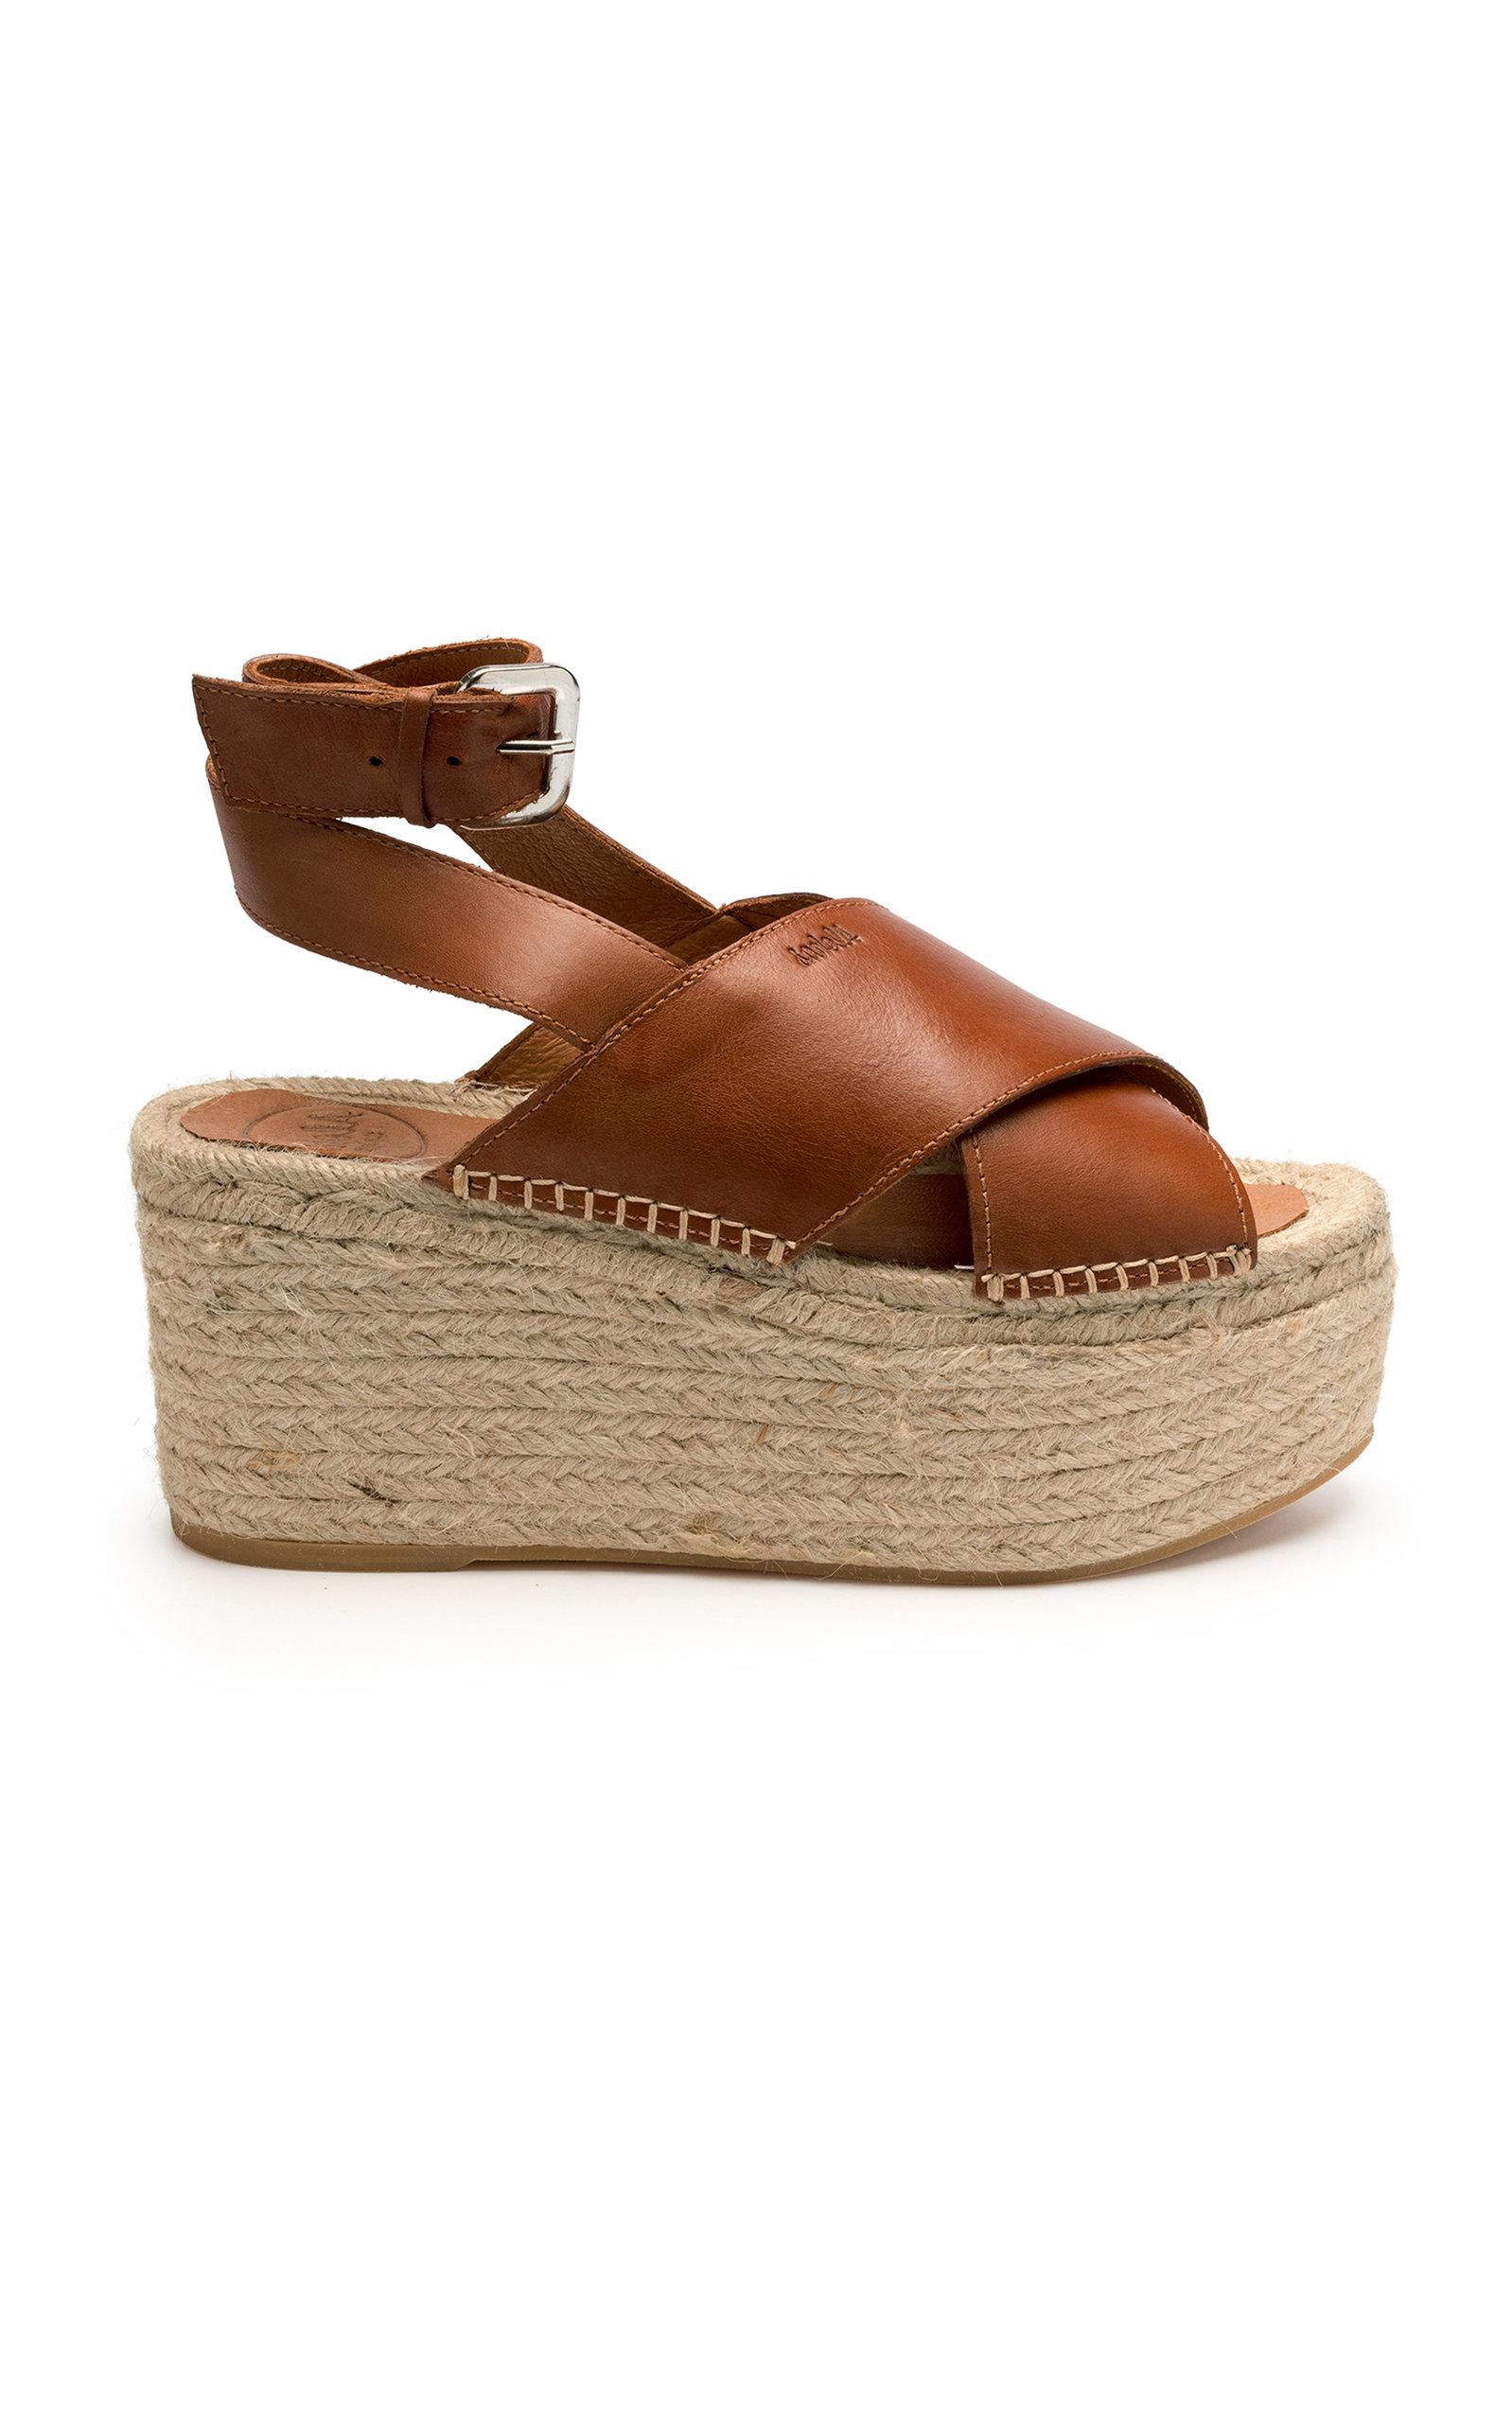 ALOHAS SANDALS Vegas Sandal in Brown